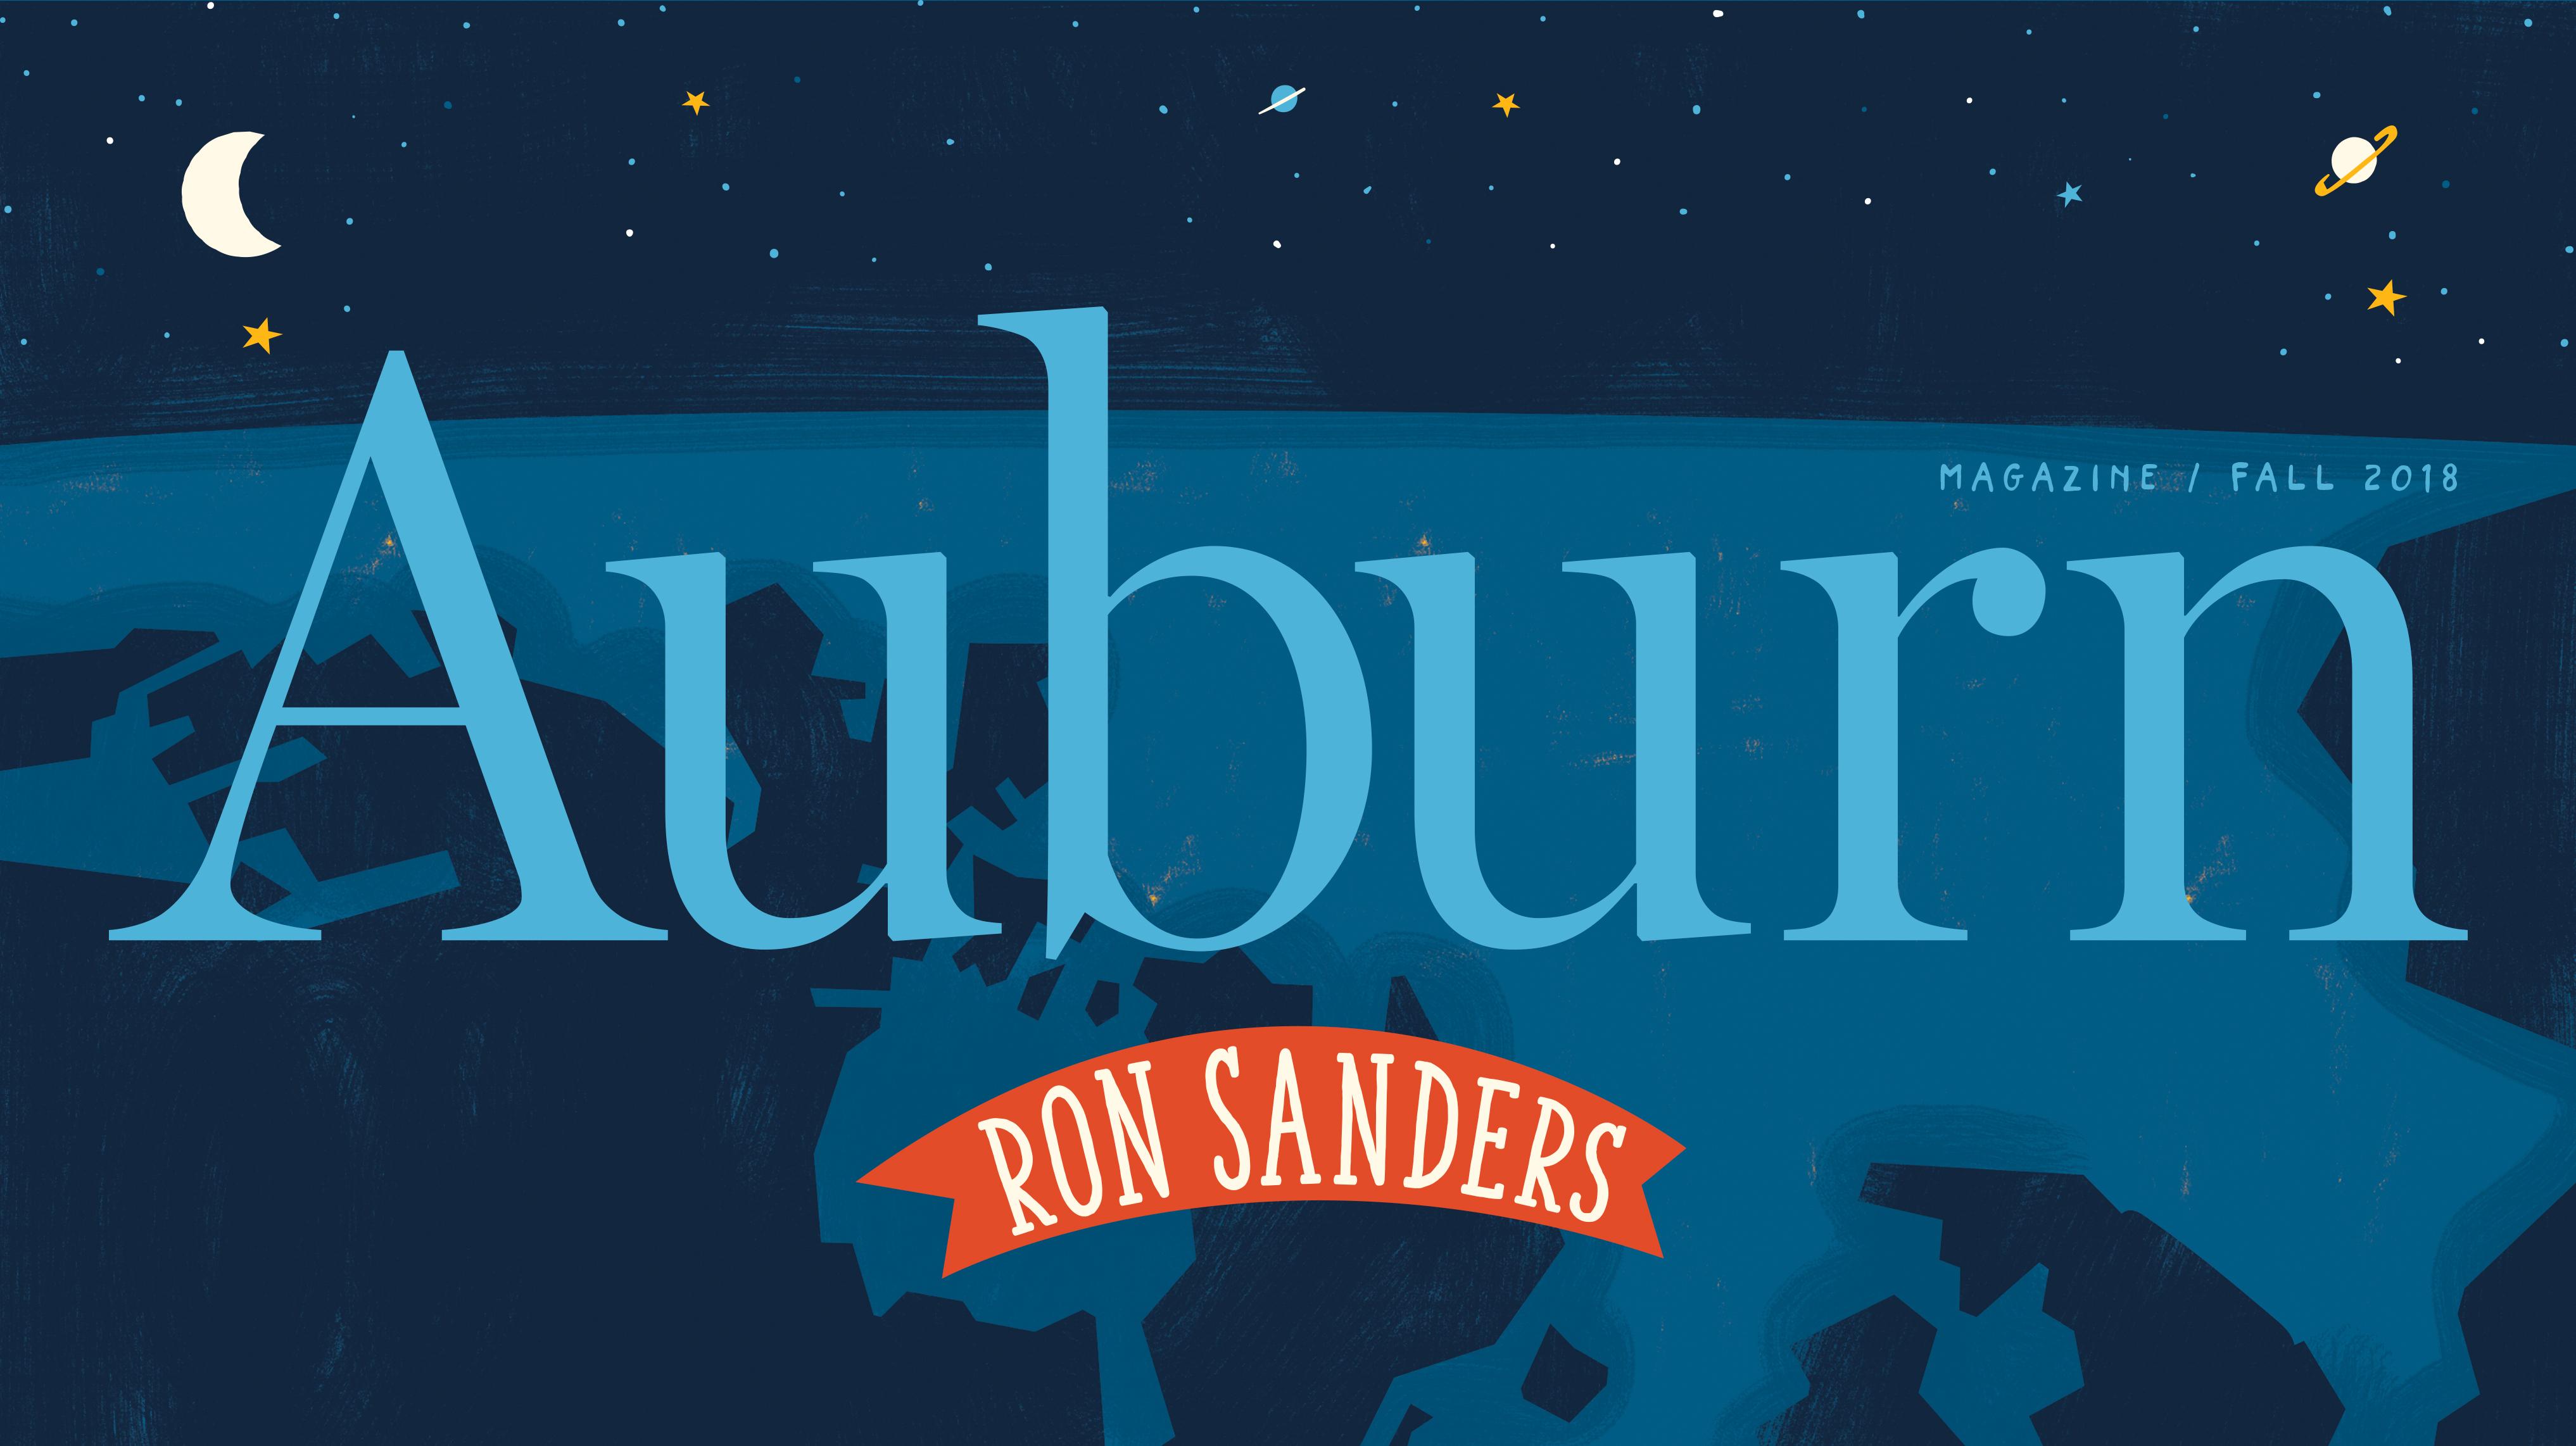 Auburn Magazine / Fall 2018 Ron Sanders